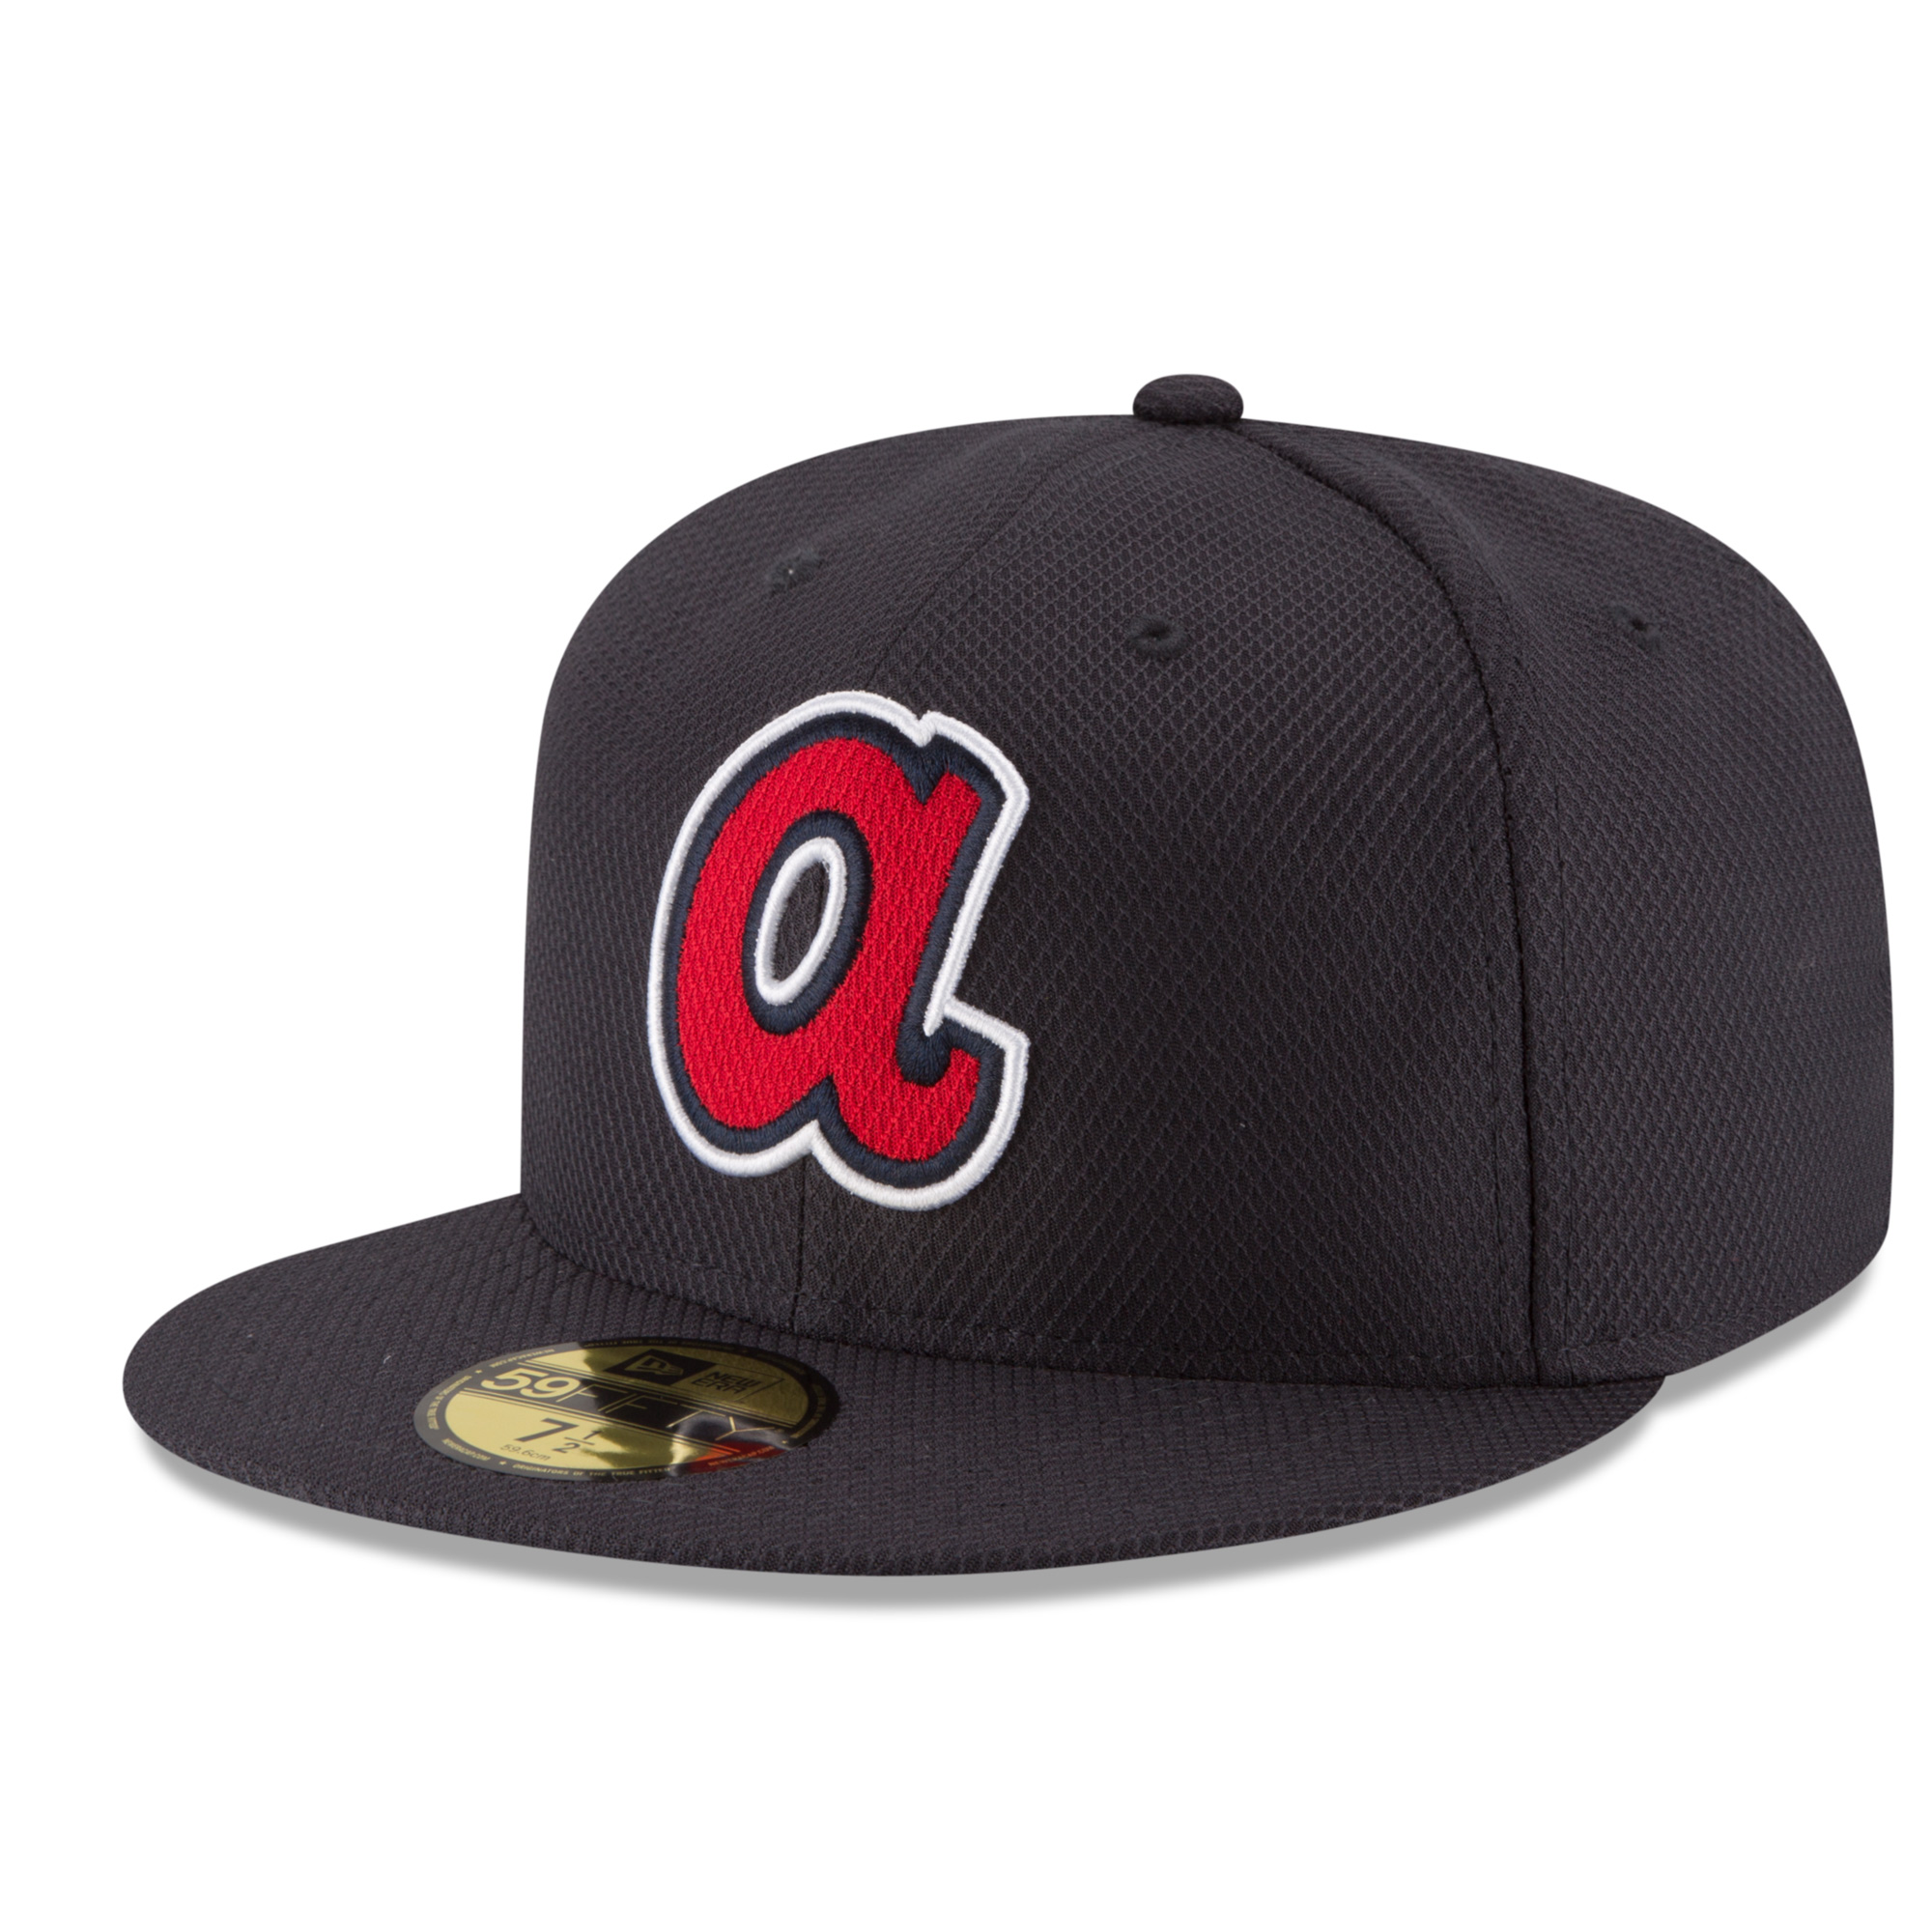 Atlanta Braves New Era Game Diamond Era 59FIFTY Fitted Hat - Navy